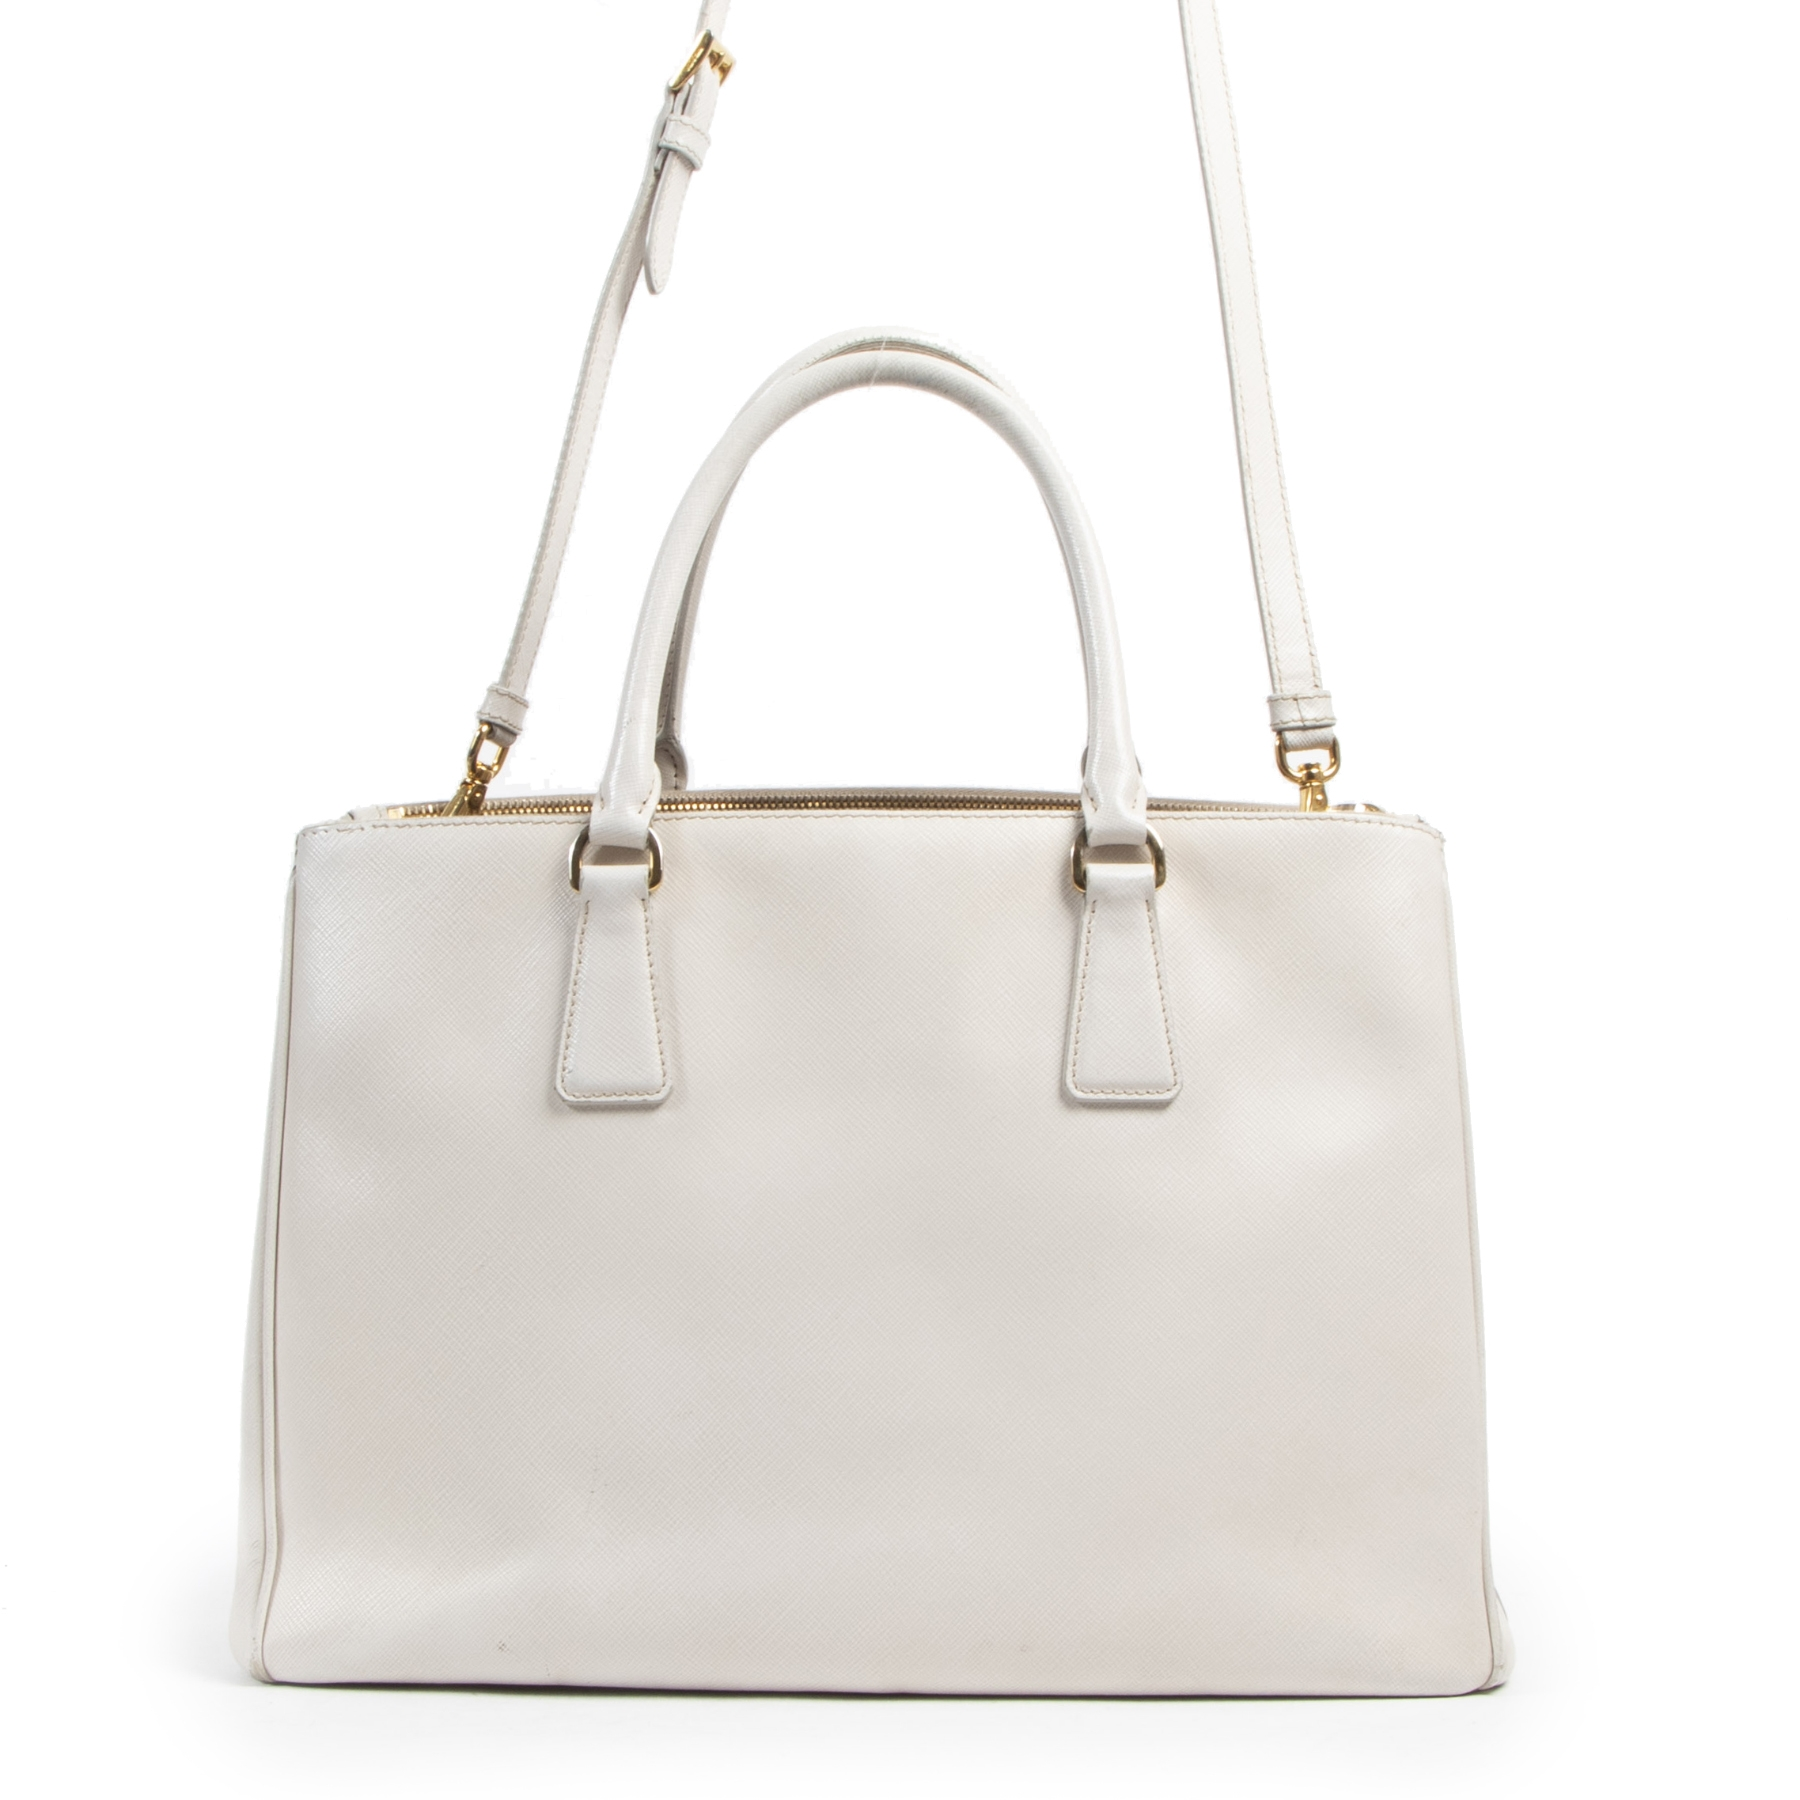 Authentic secondhand Prada White Saffiano Tote Bag designer bags fashion luxury vintage webshop safe secure online shopping designer high end brands